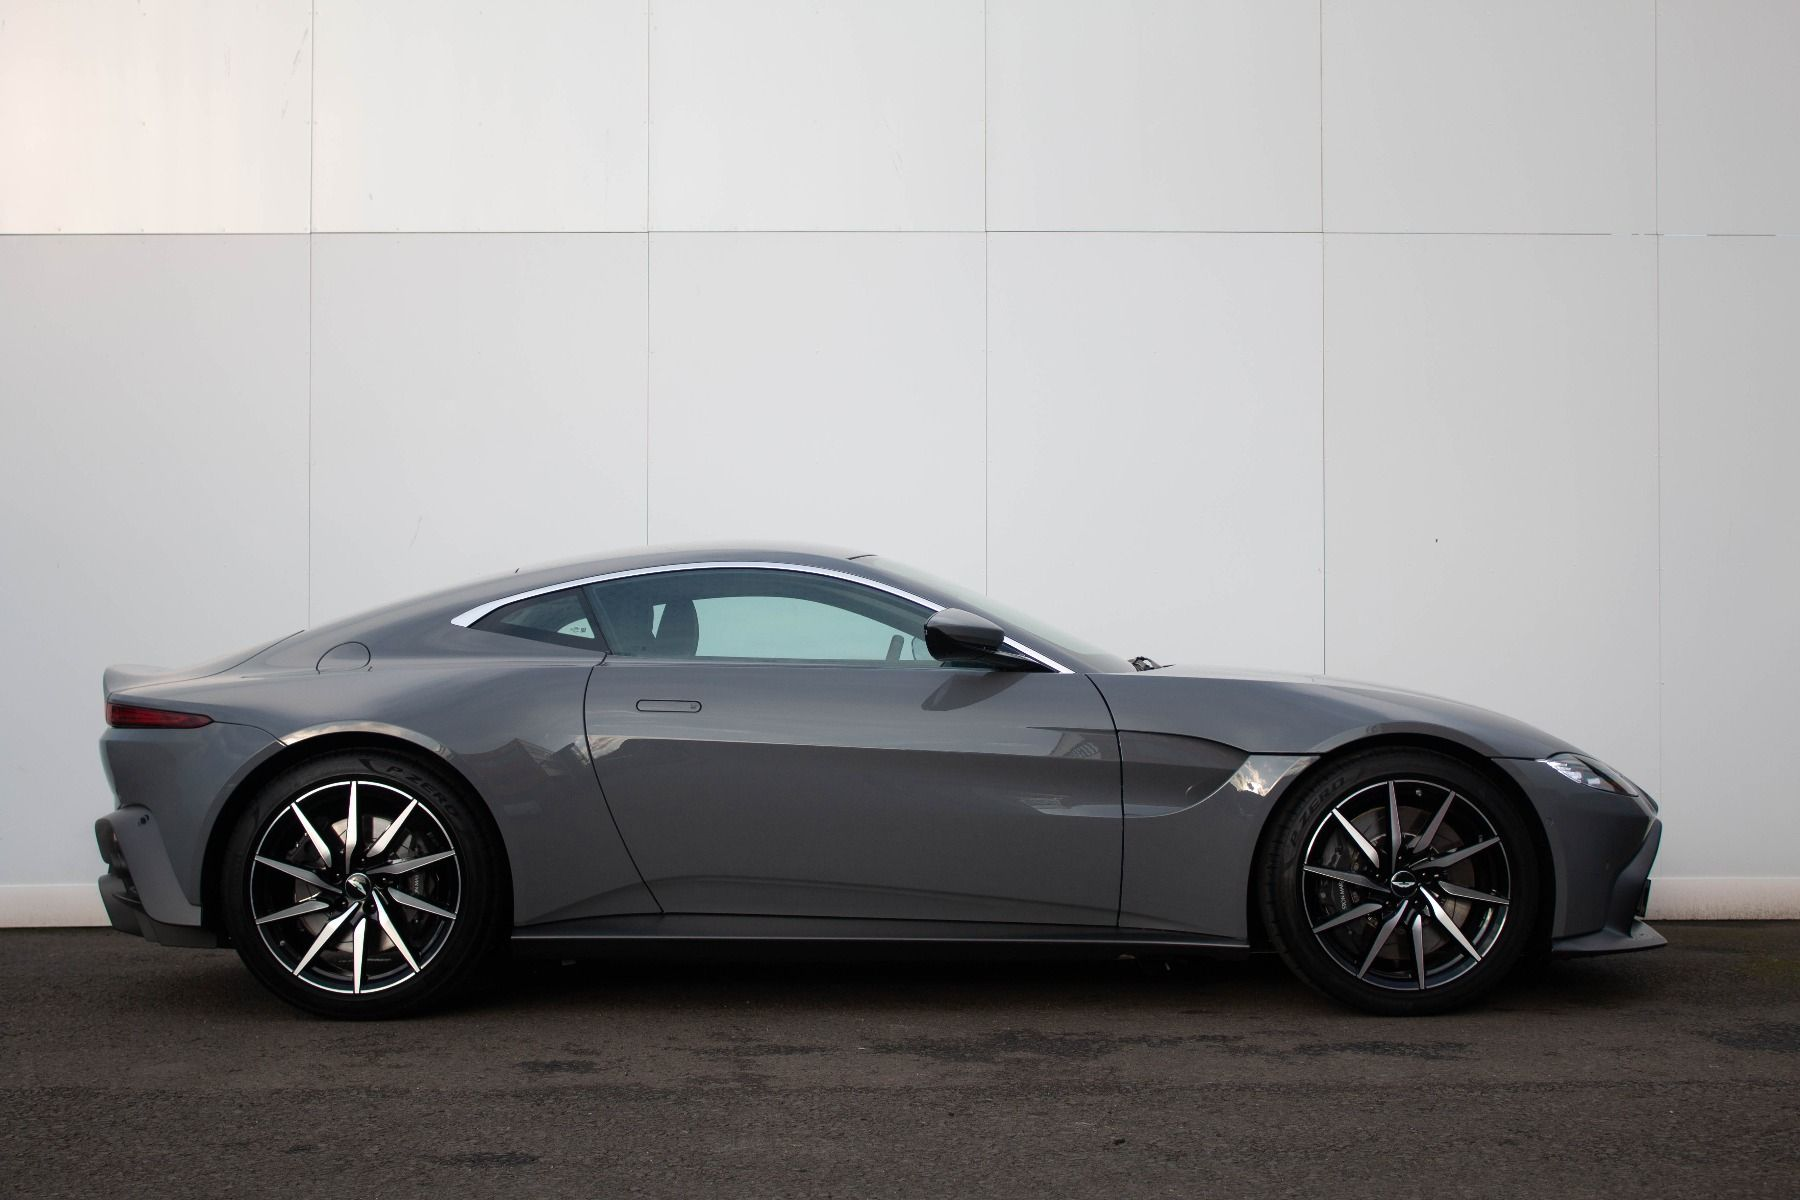 Aston Martin V8 Vantage Coupe 2dr ZF 8 Speed image 3